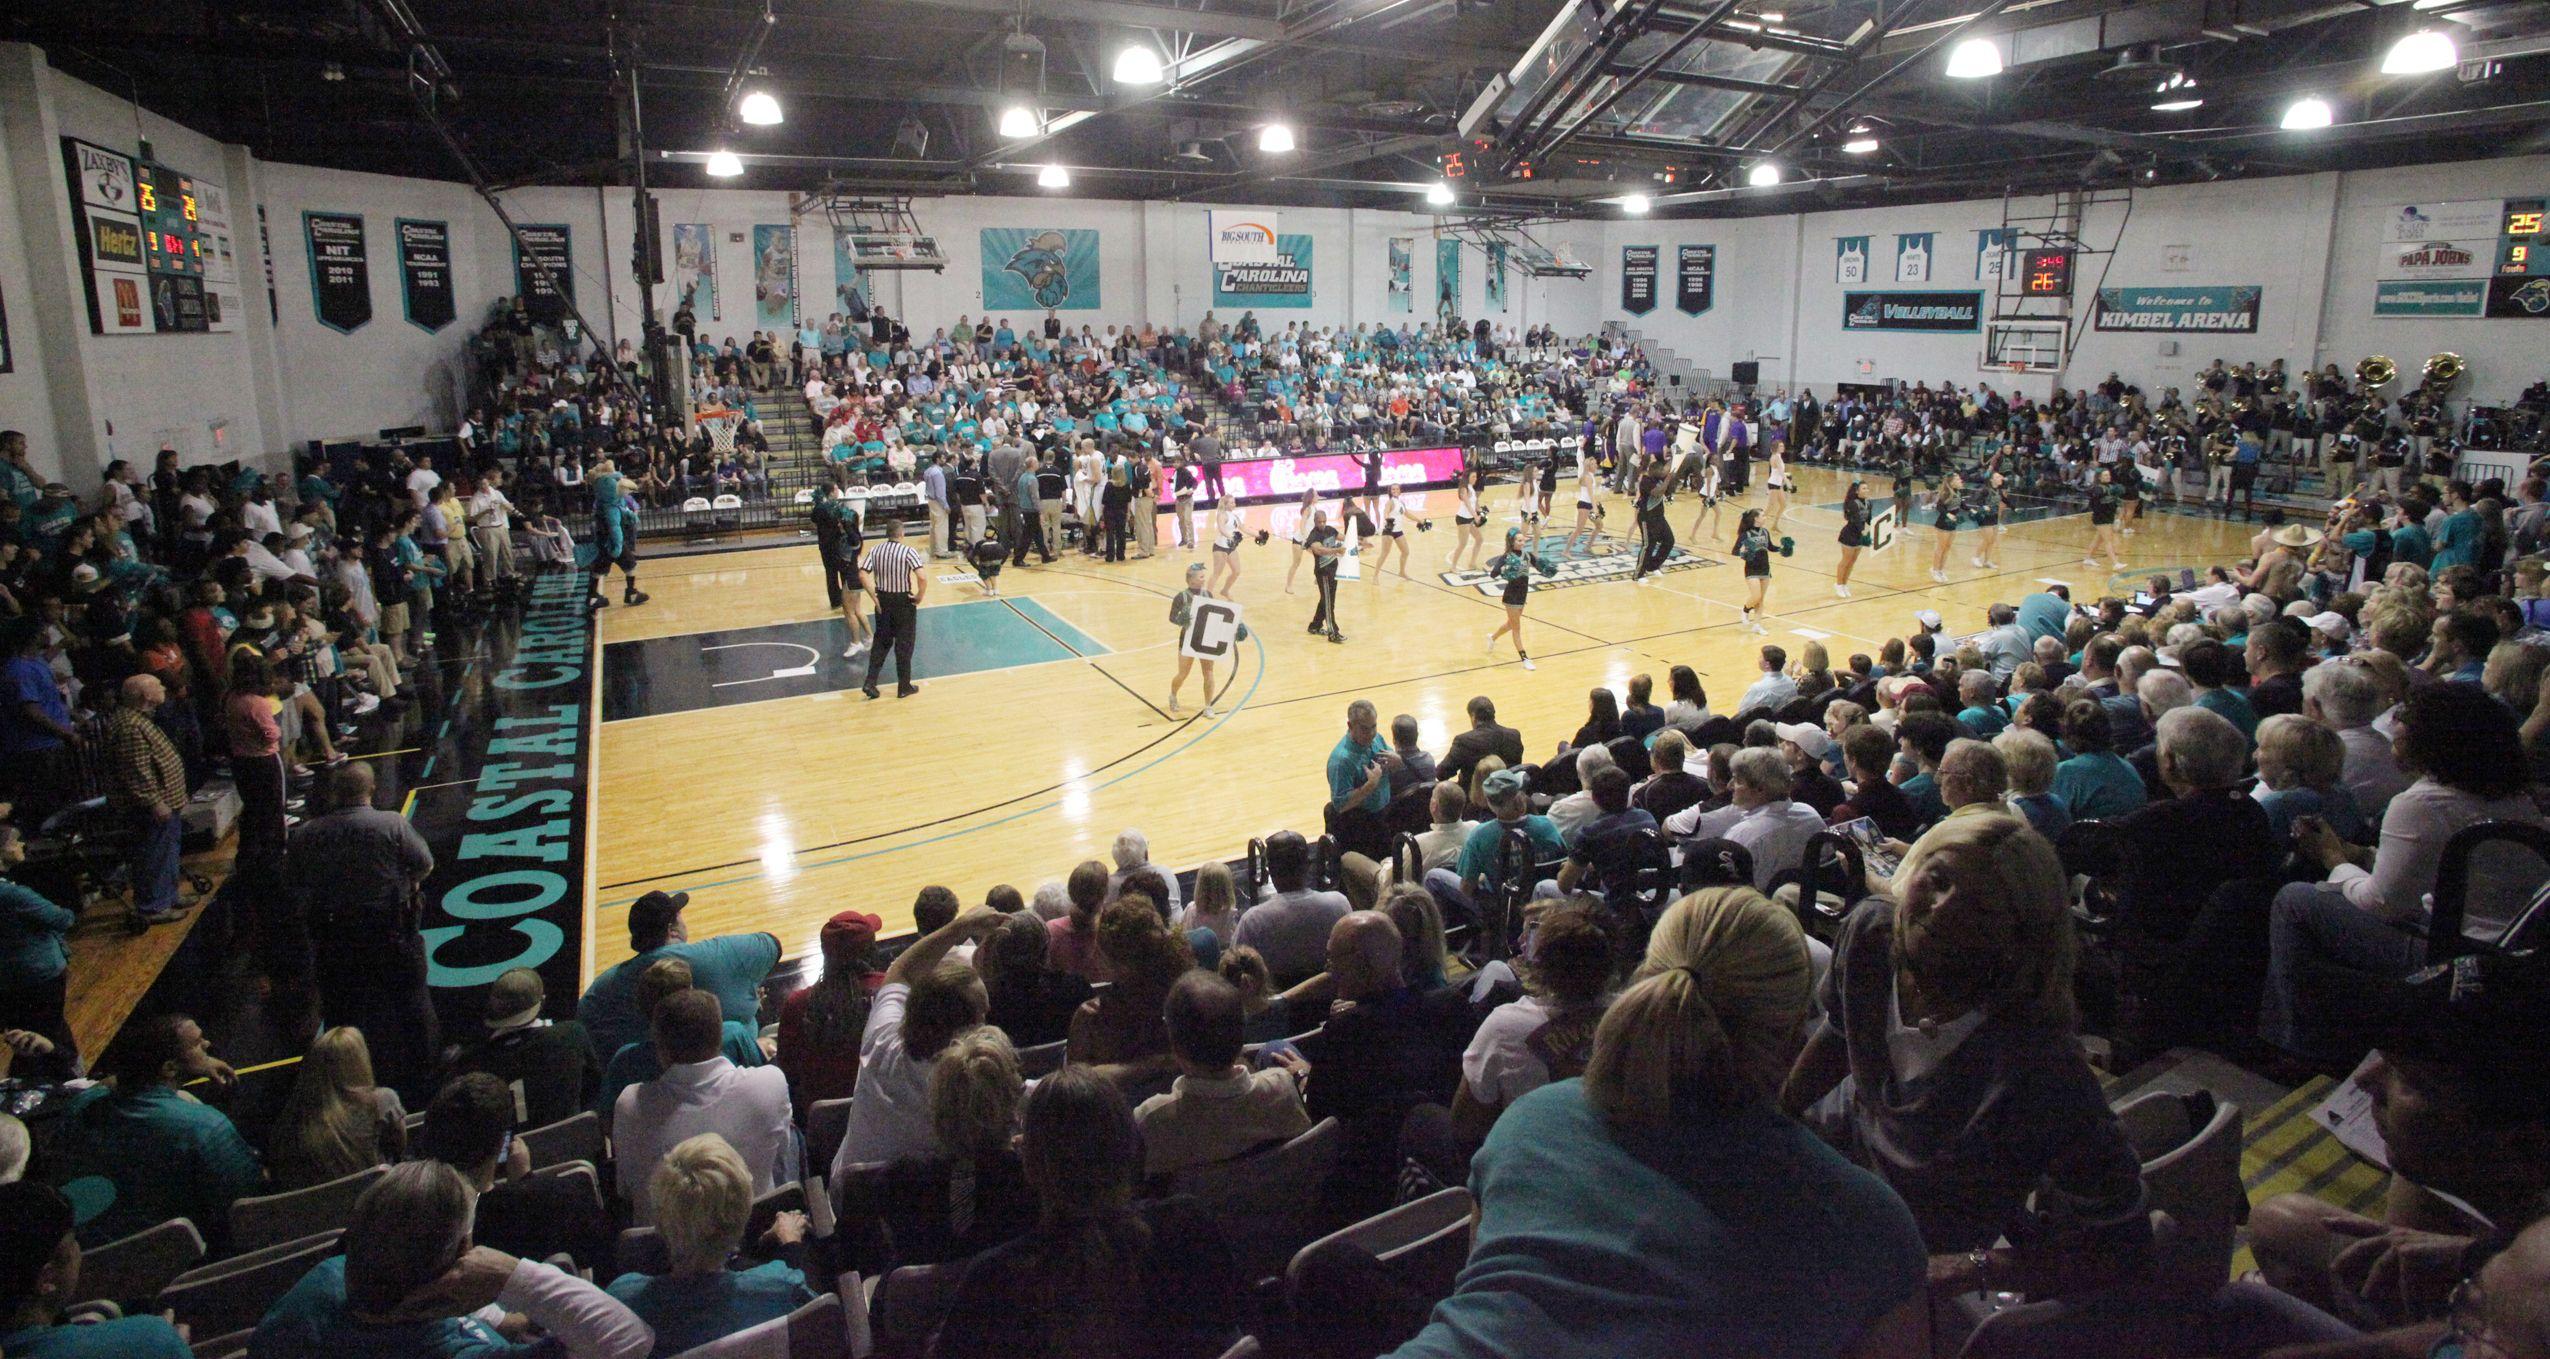 Kimbel Arena Former Home Of Volleyball Men And Women S Basketball Oh The Good Times We Share Coastal Carolina University Womens Basketball Coastal Carolina